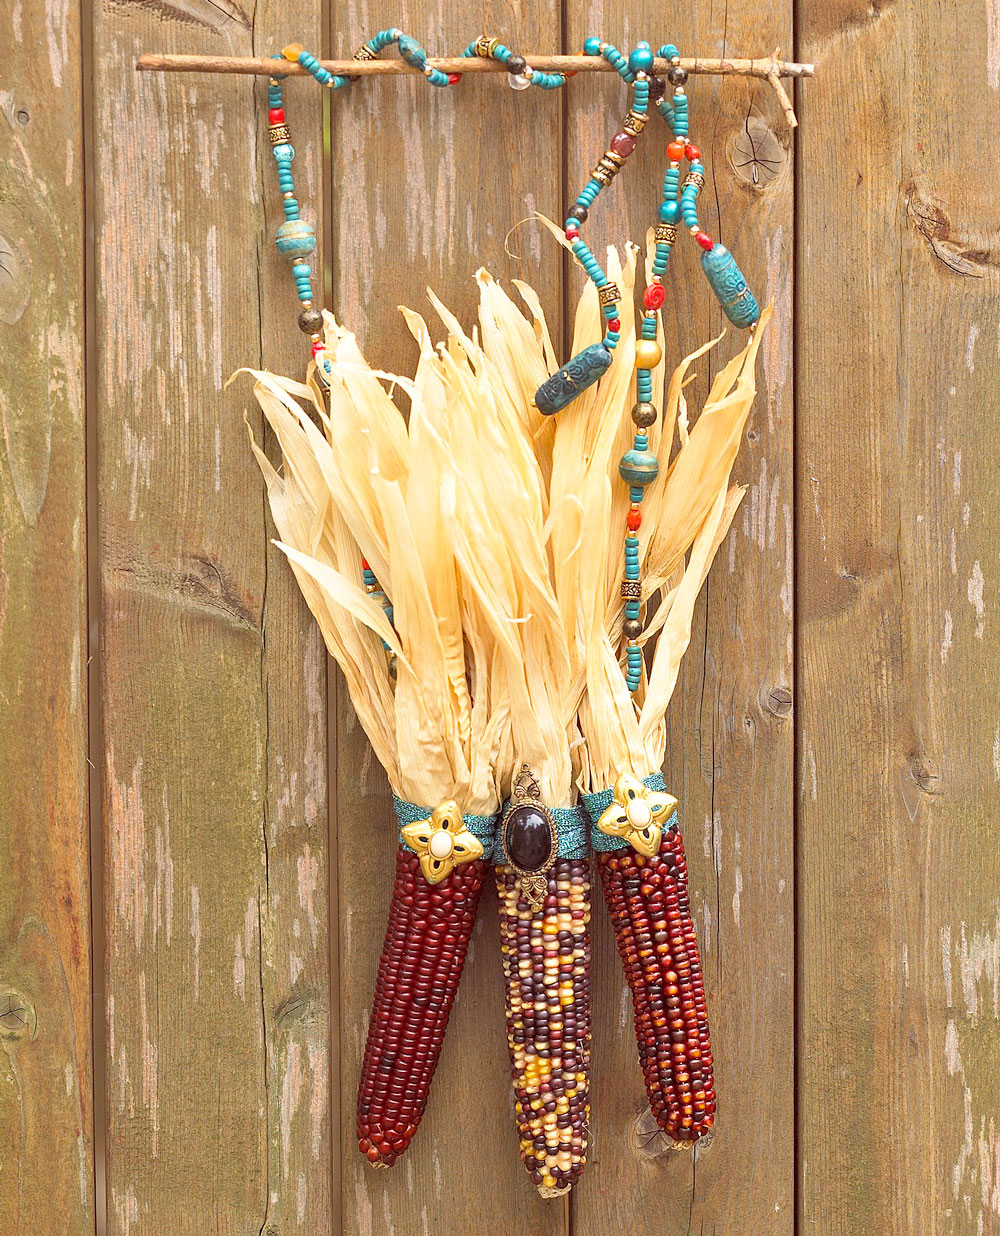 Beads and corn